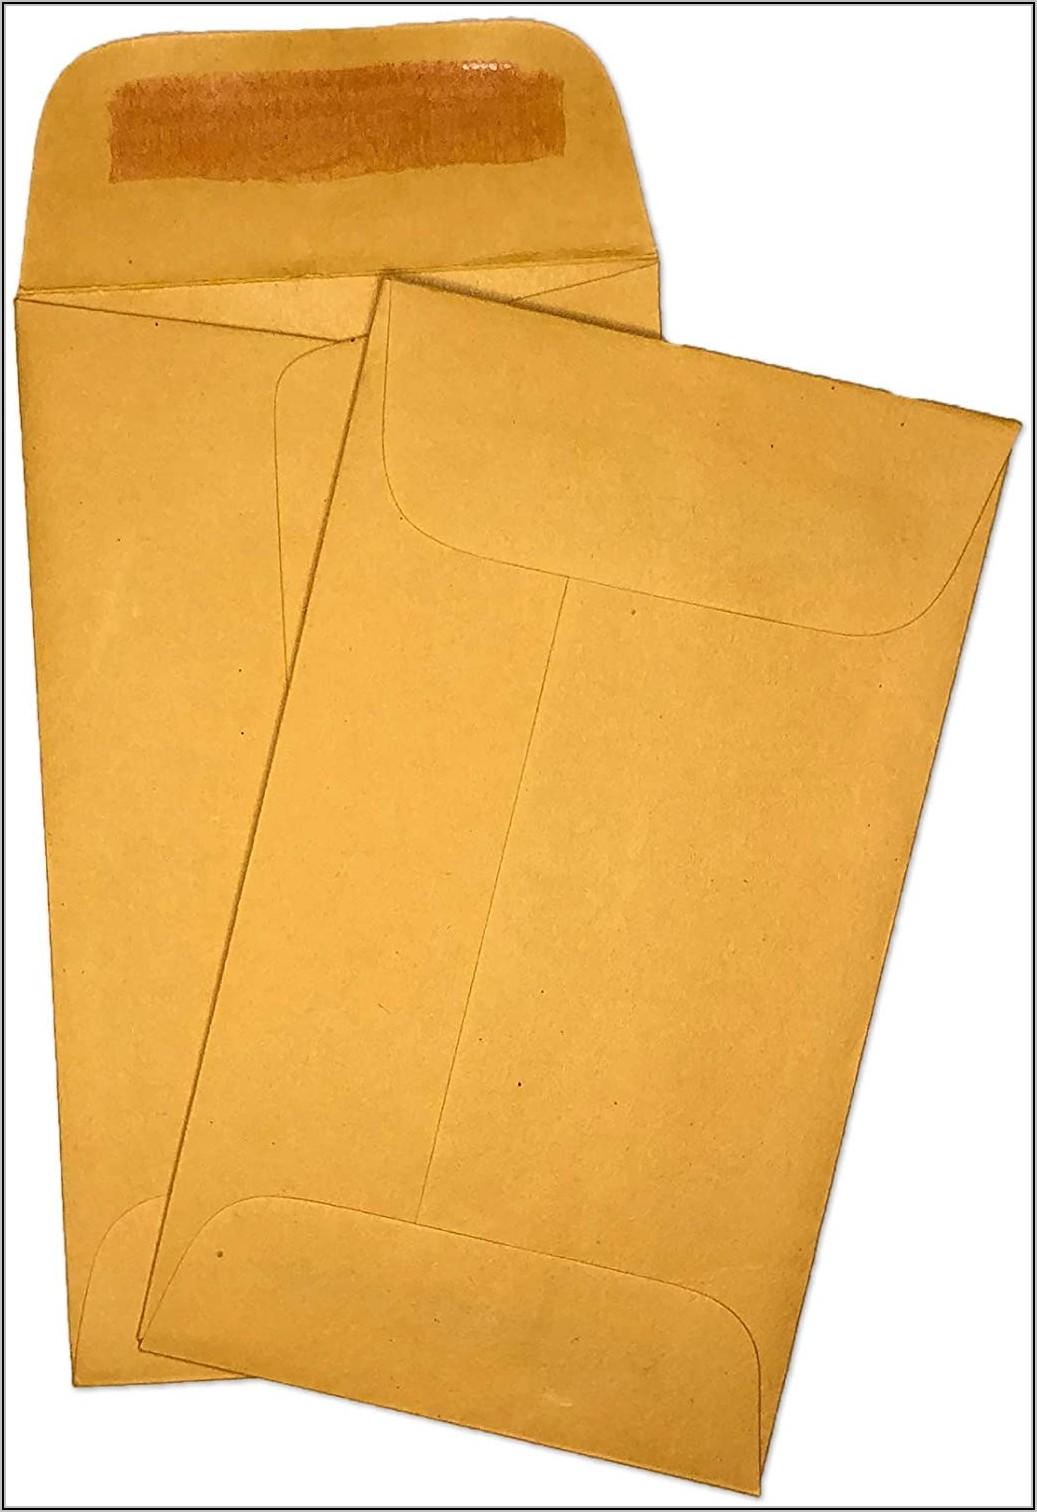 3 12 X 6 Envelopes